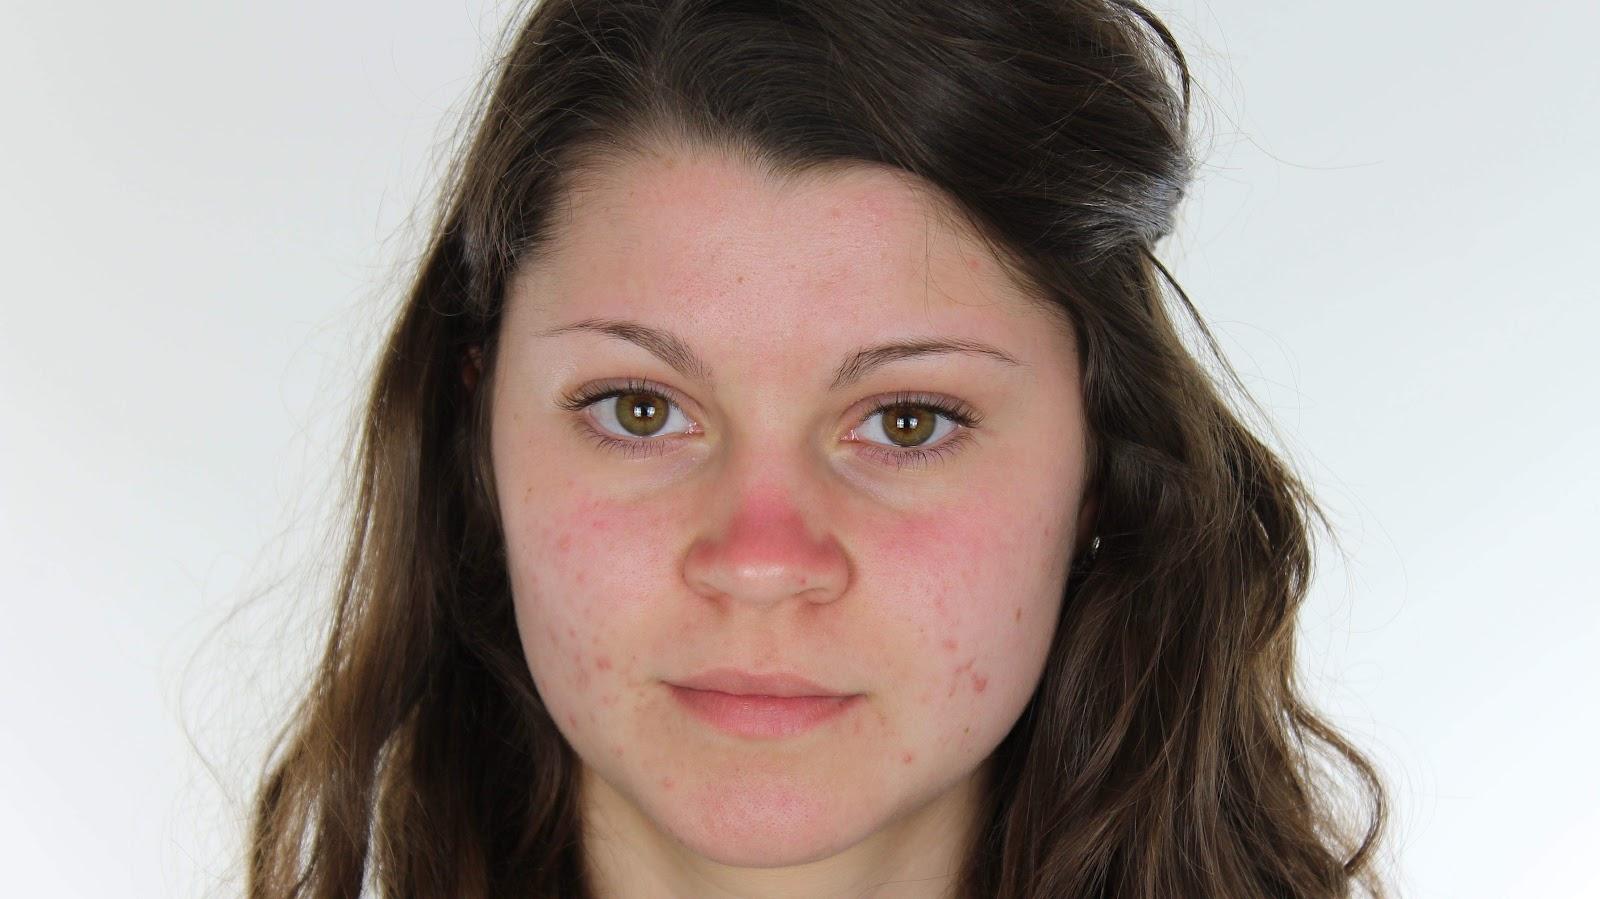 Face Pimples Propecia